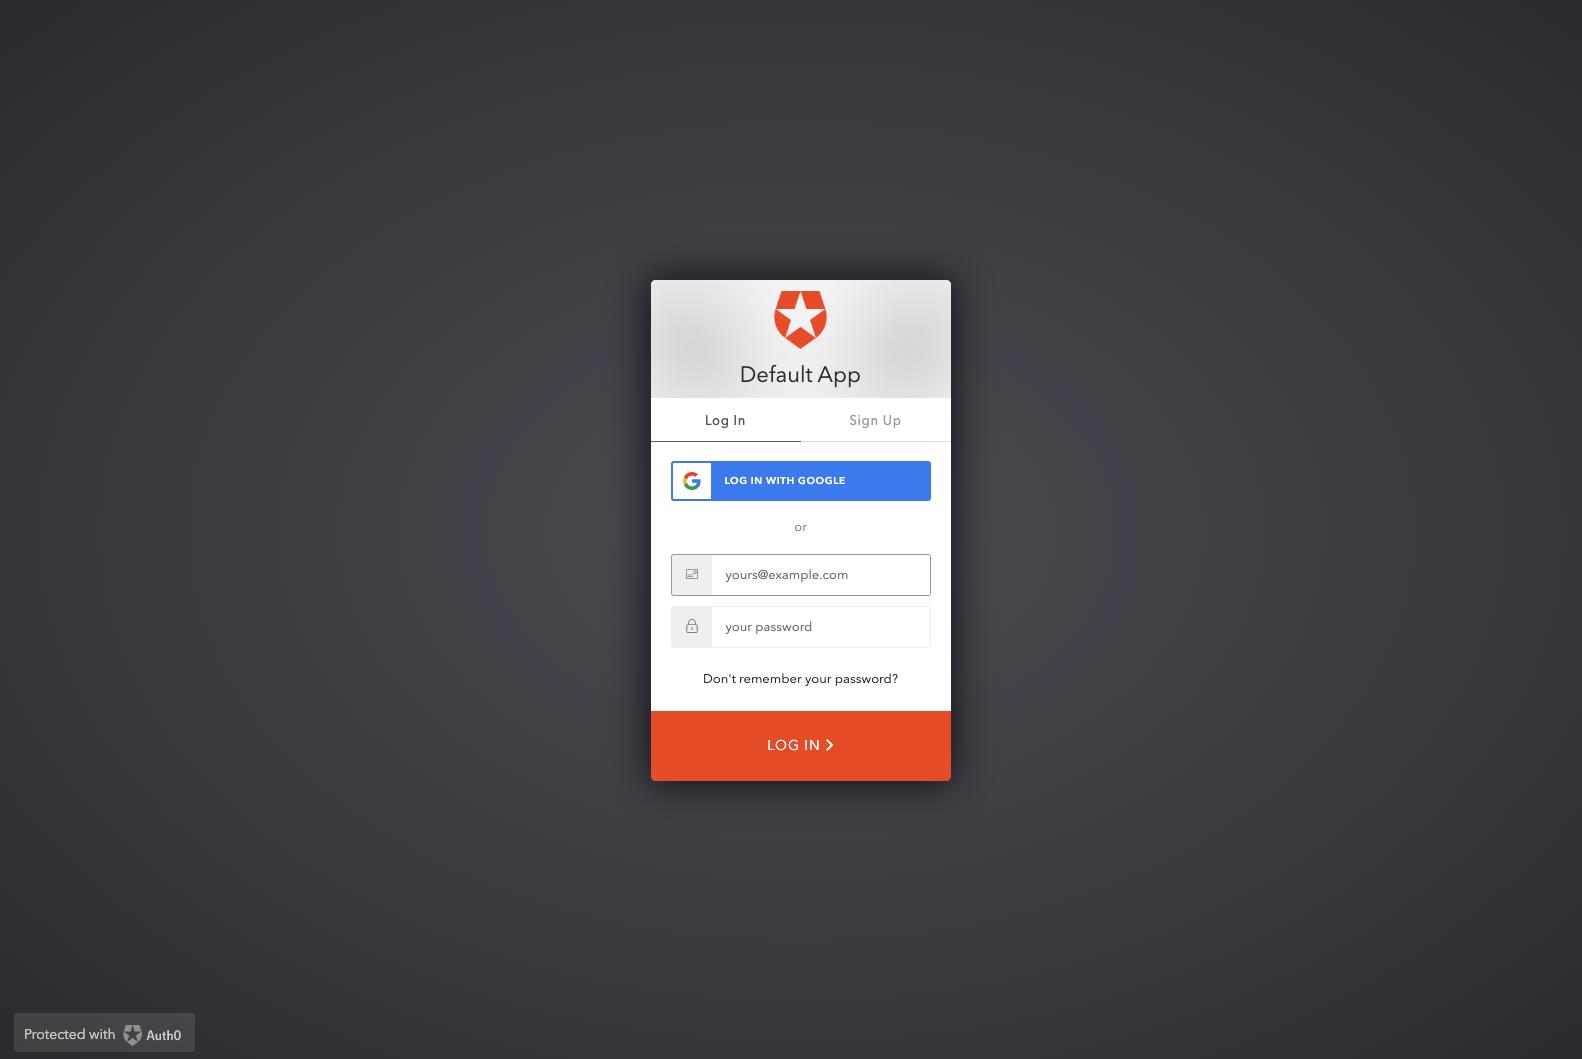 Laravel 6 Auth0 default app Login modal